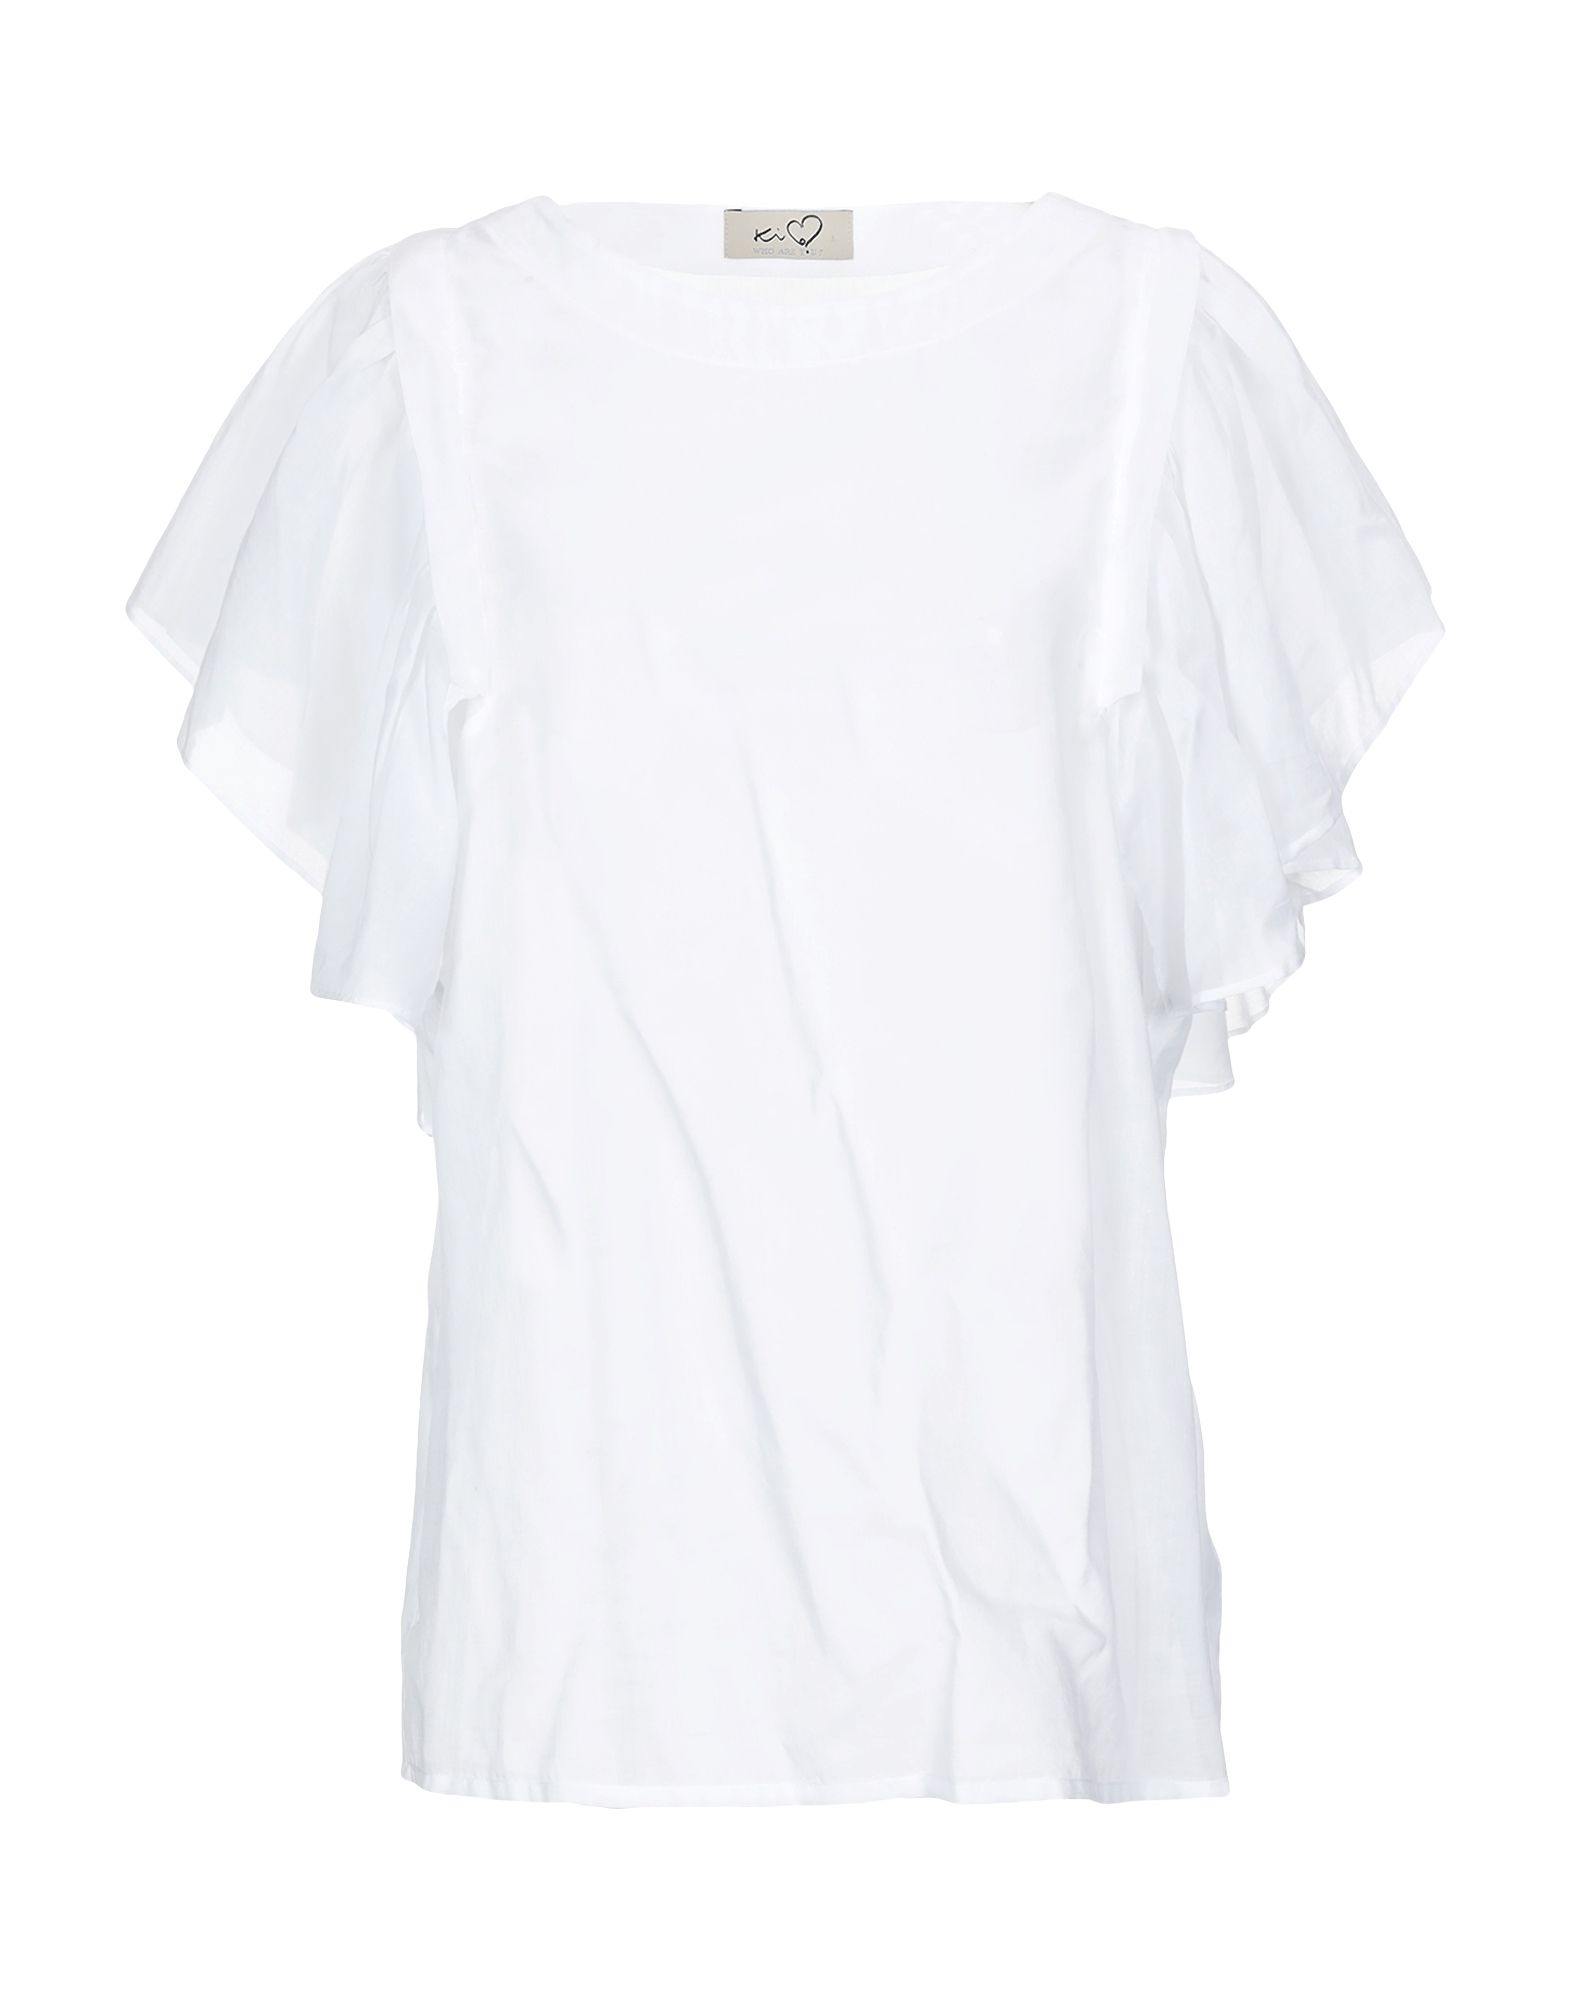 KI6? WHO ARE YOU? Блузка стоимость